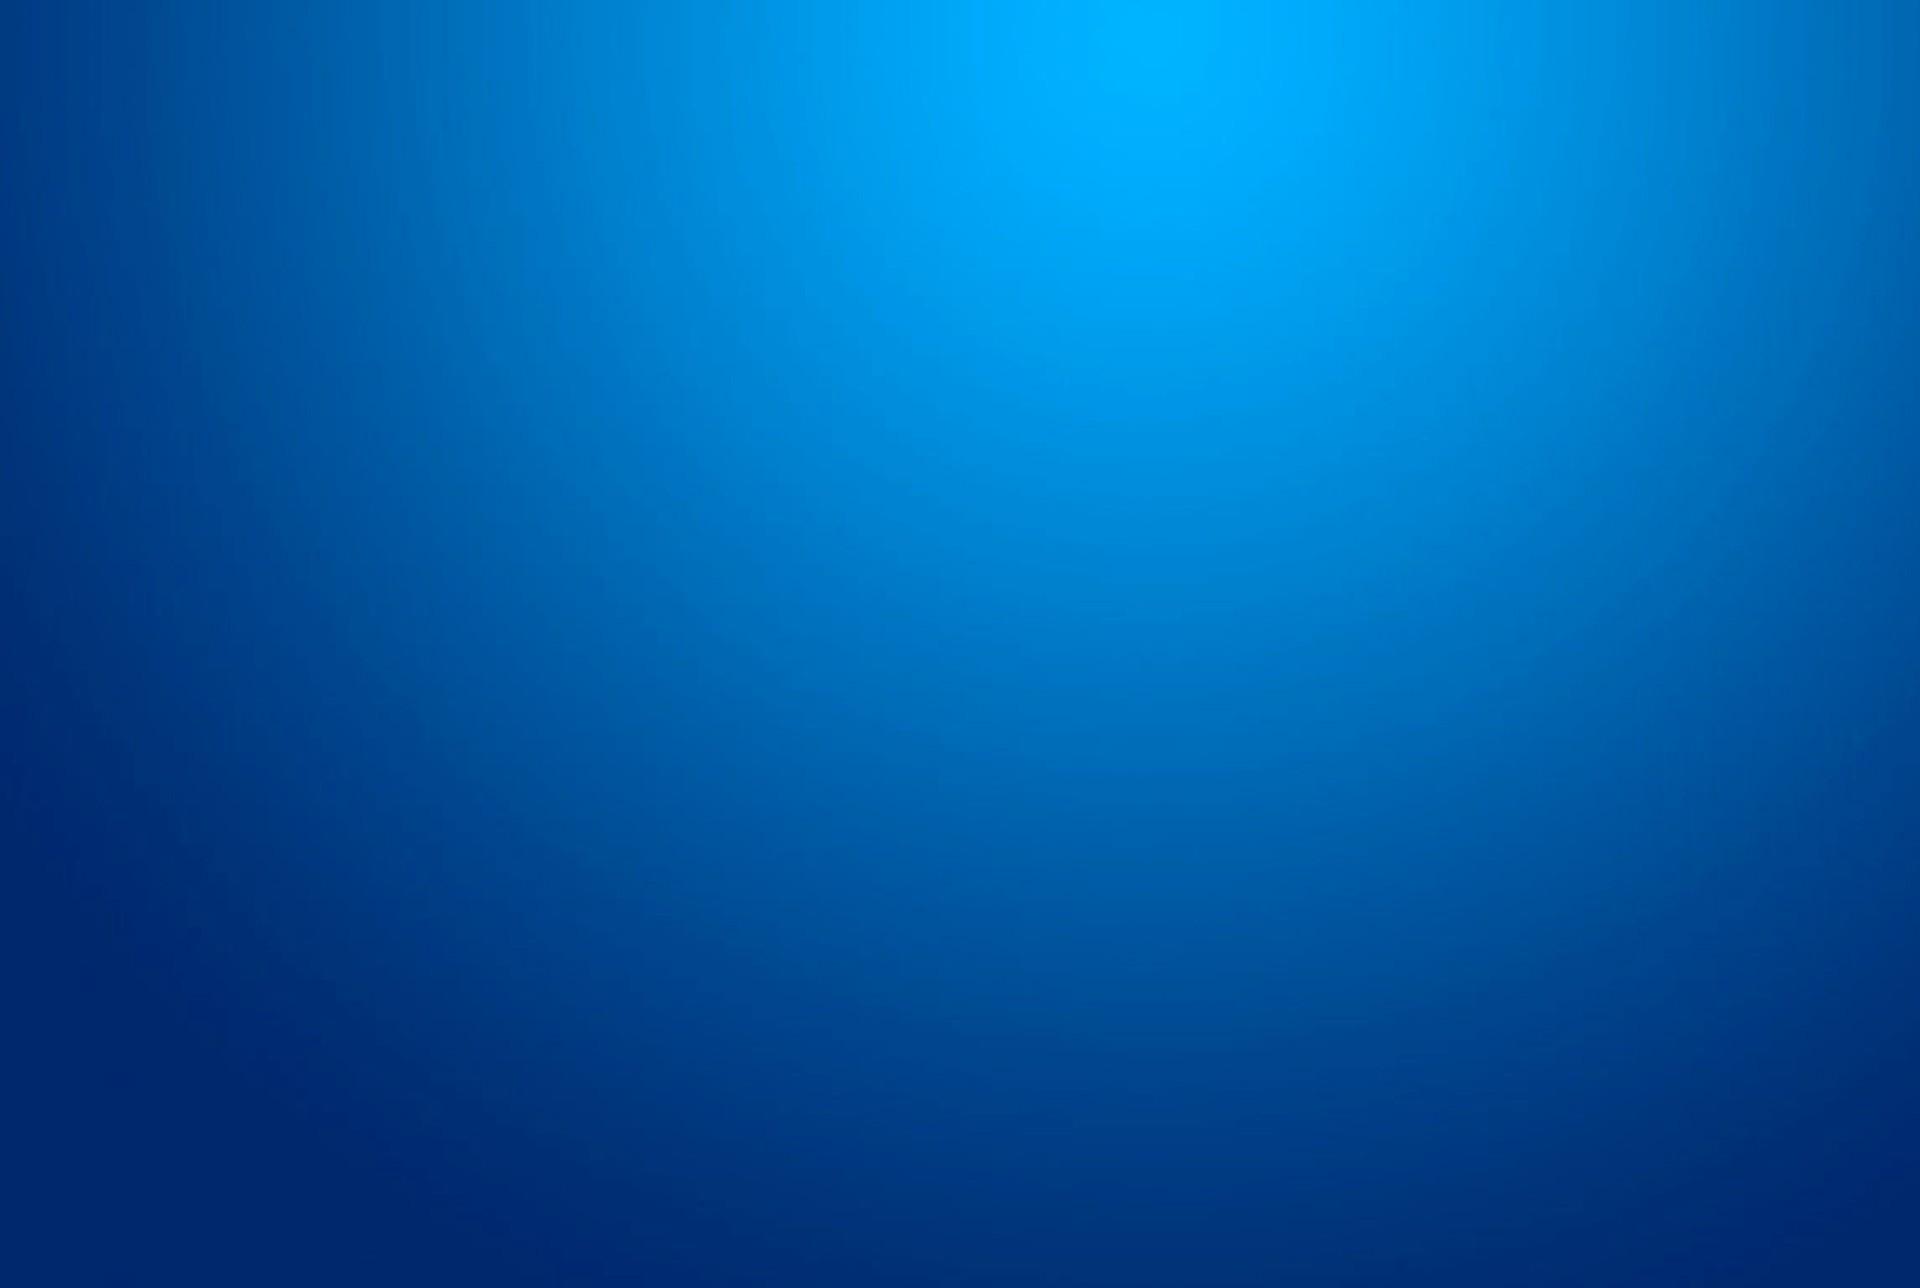 Cool Blue Backgrounds New Plain White Desktop Wallpaper Pc Plain White Desktop Wallpaper Maven Infotech